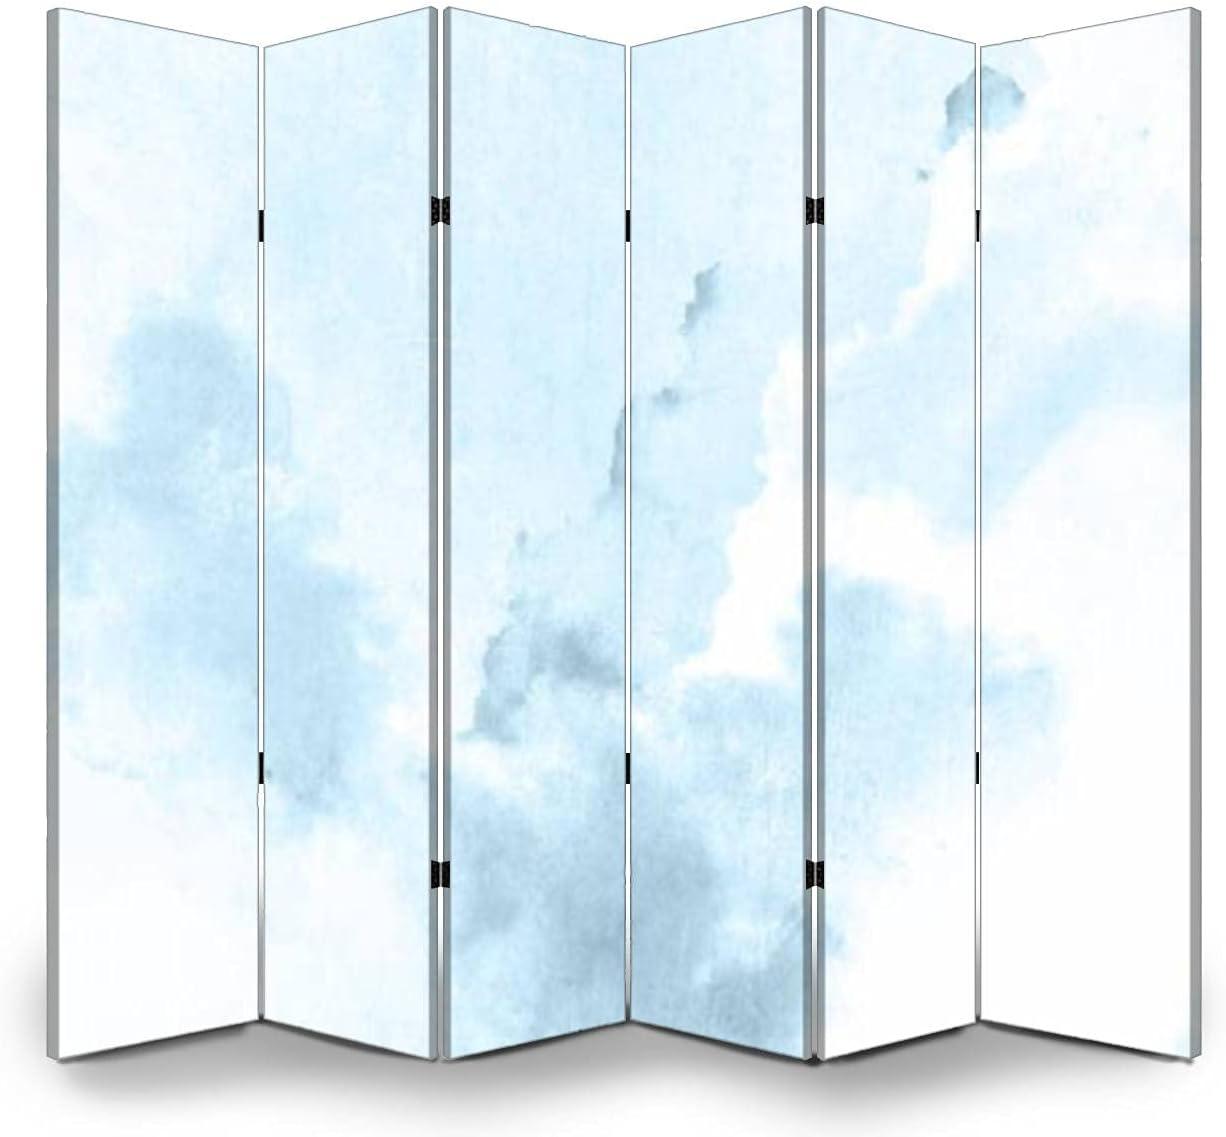 Cheap sale 6 Panels Room Divider Screen Backgroun Partition Blue Under blast sales Watercolor